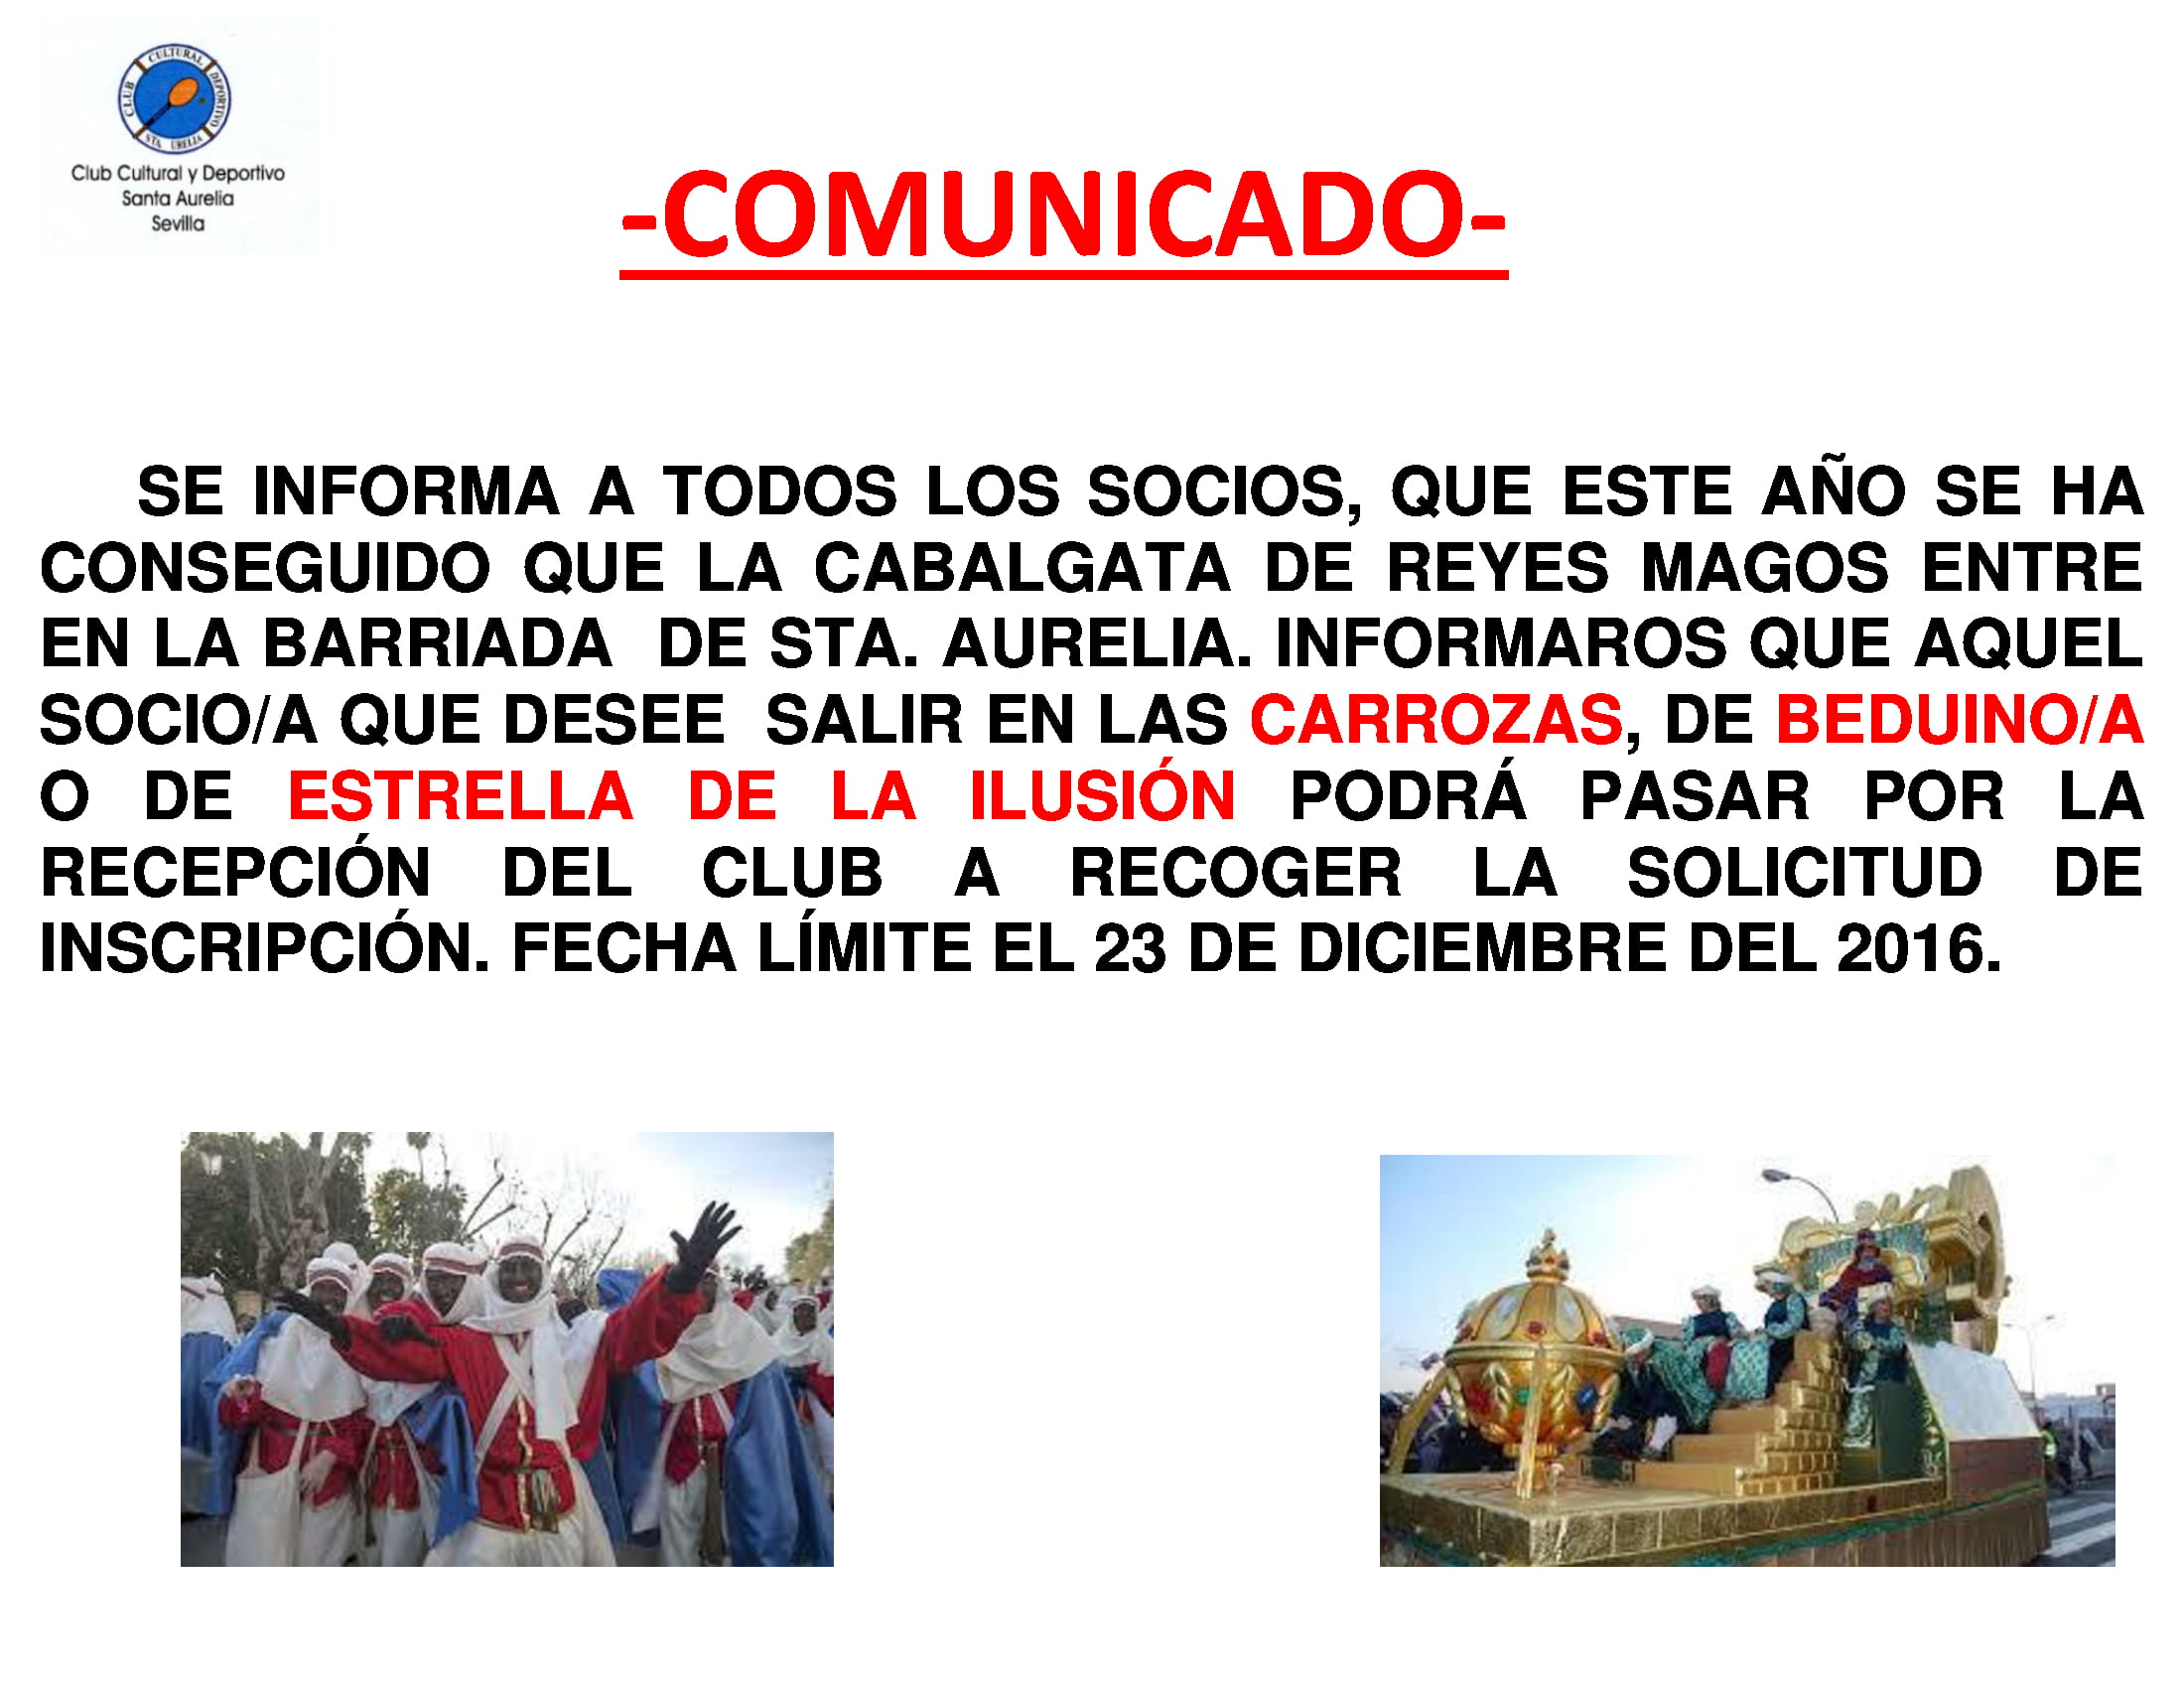 COMUNICADO CABALGATAS DE REYES